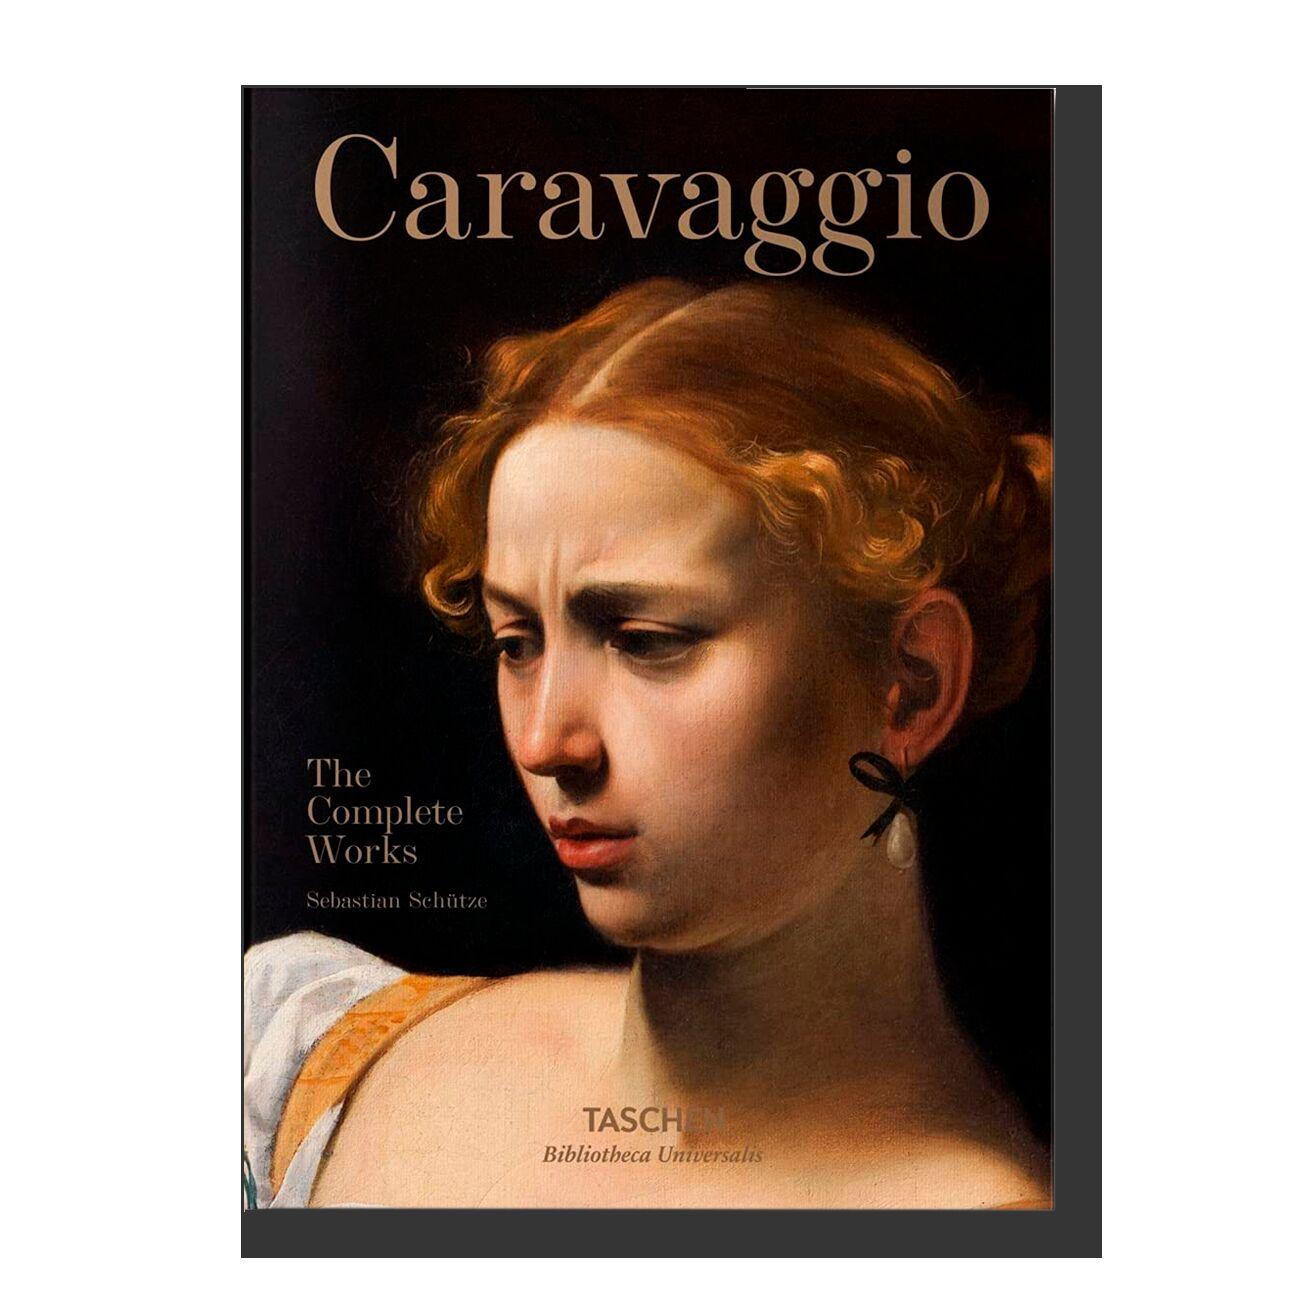 Caravaggio: The Complete Works (Bibliotheca Universalis)